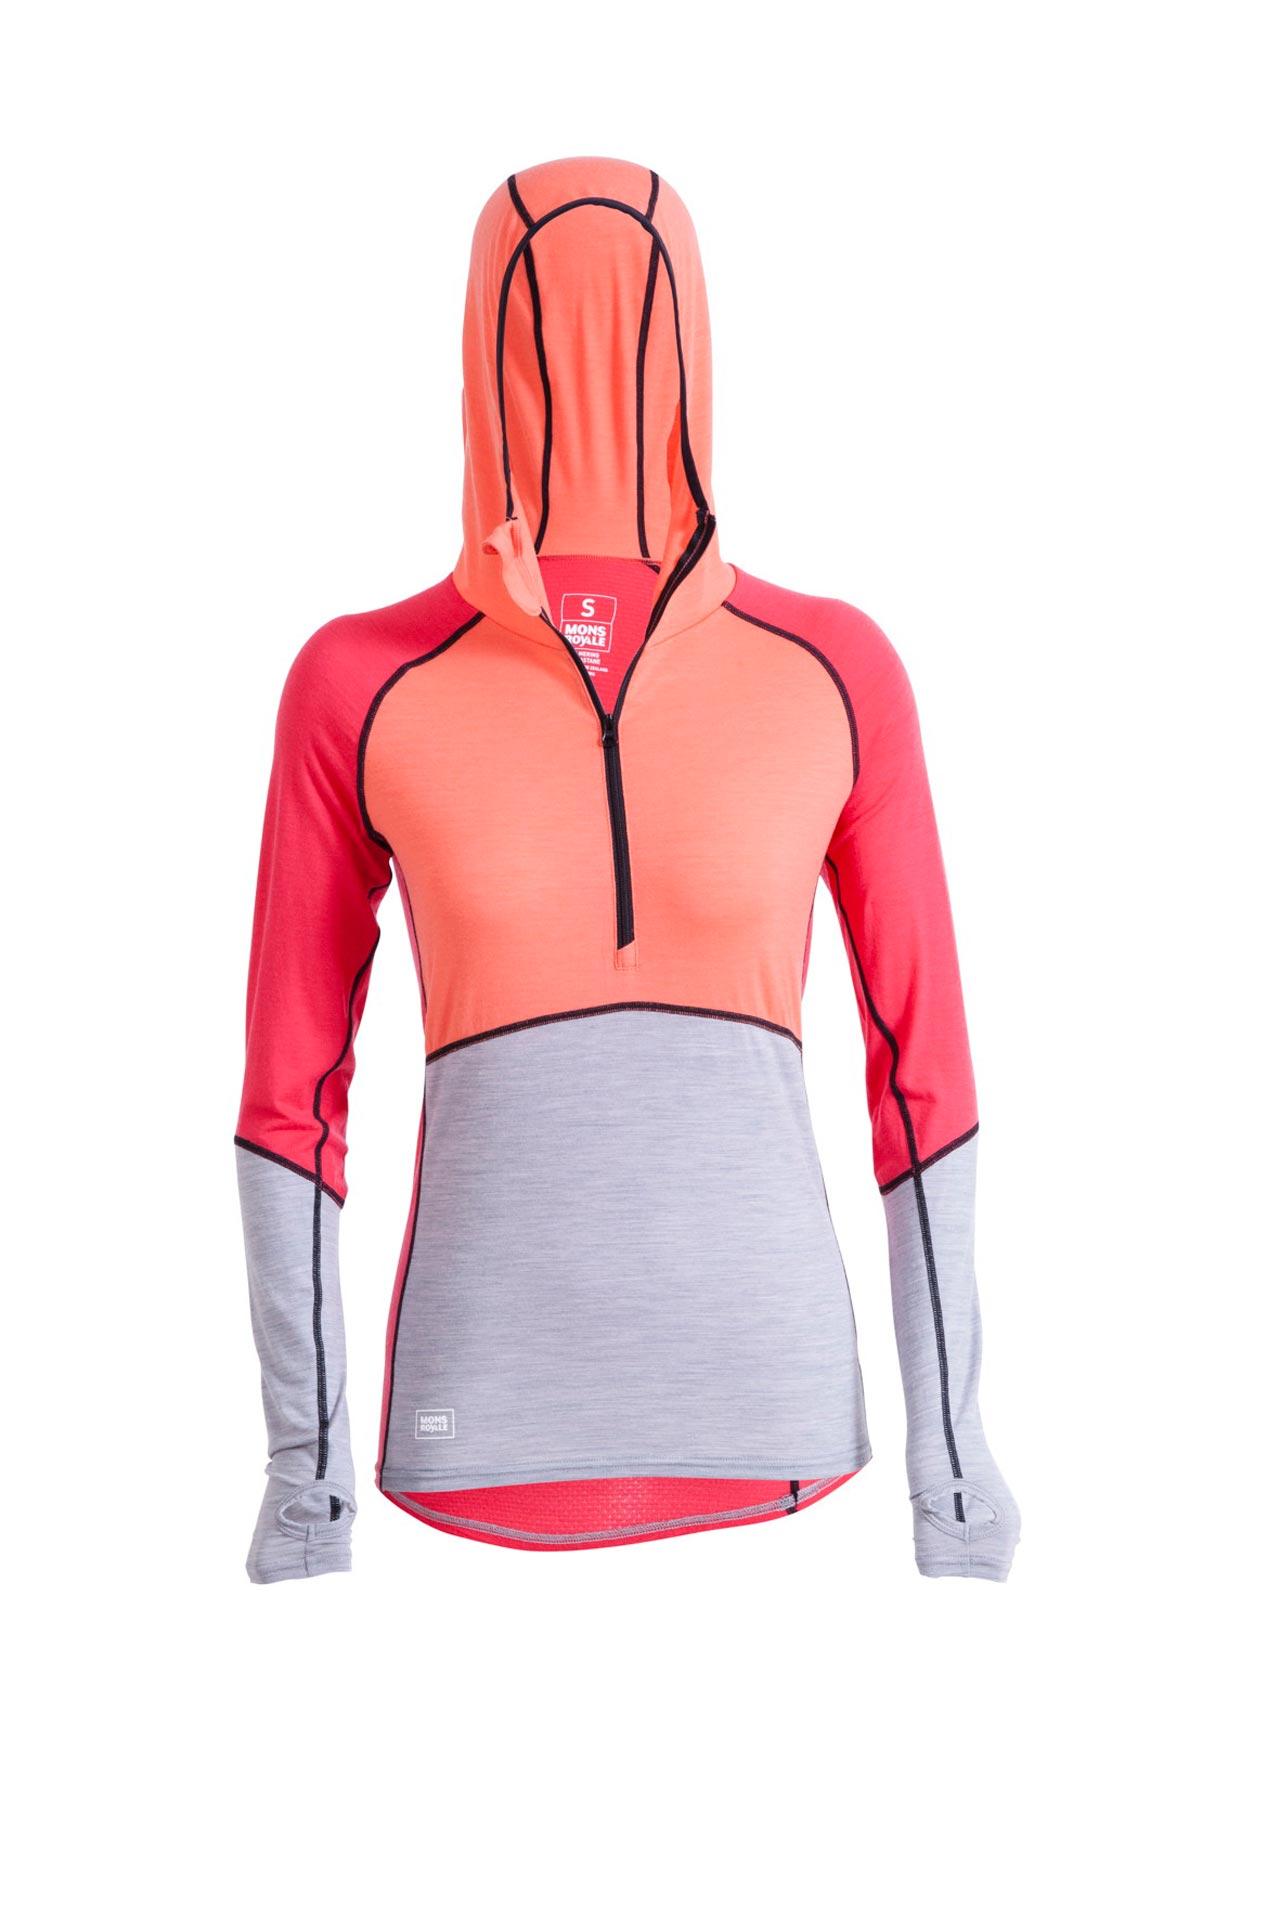 prime_skiing_brandguide_mons-royale_bella-coola-tech-ls-zip-hoody_pink-coral-grey-marl_front-1